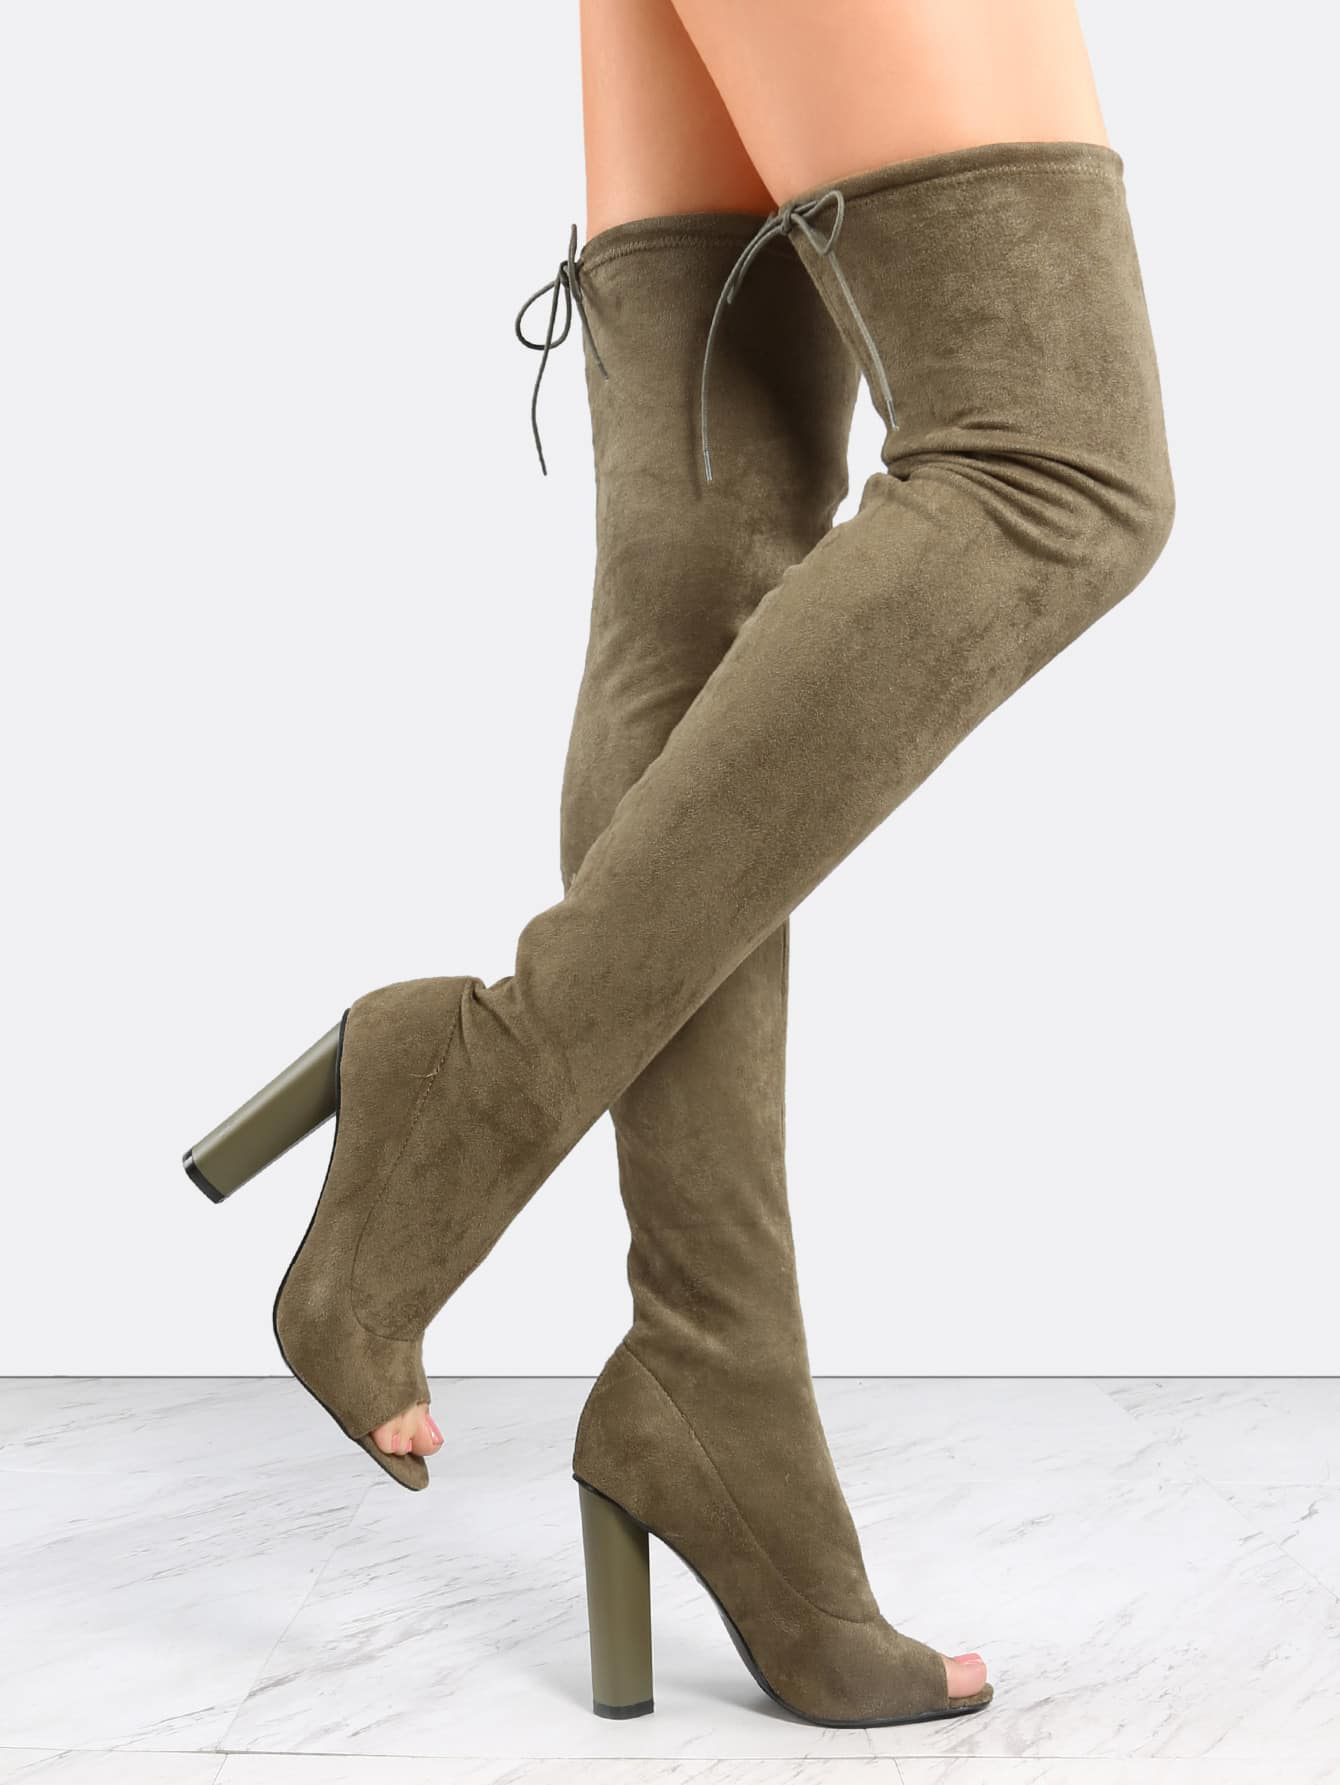 Olive Green Suede Peep Toe Chunky Heel